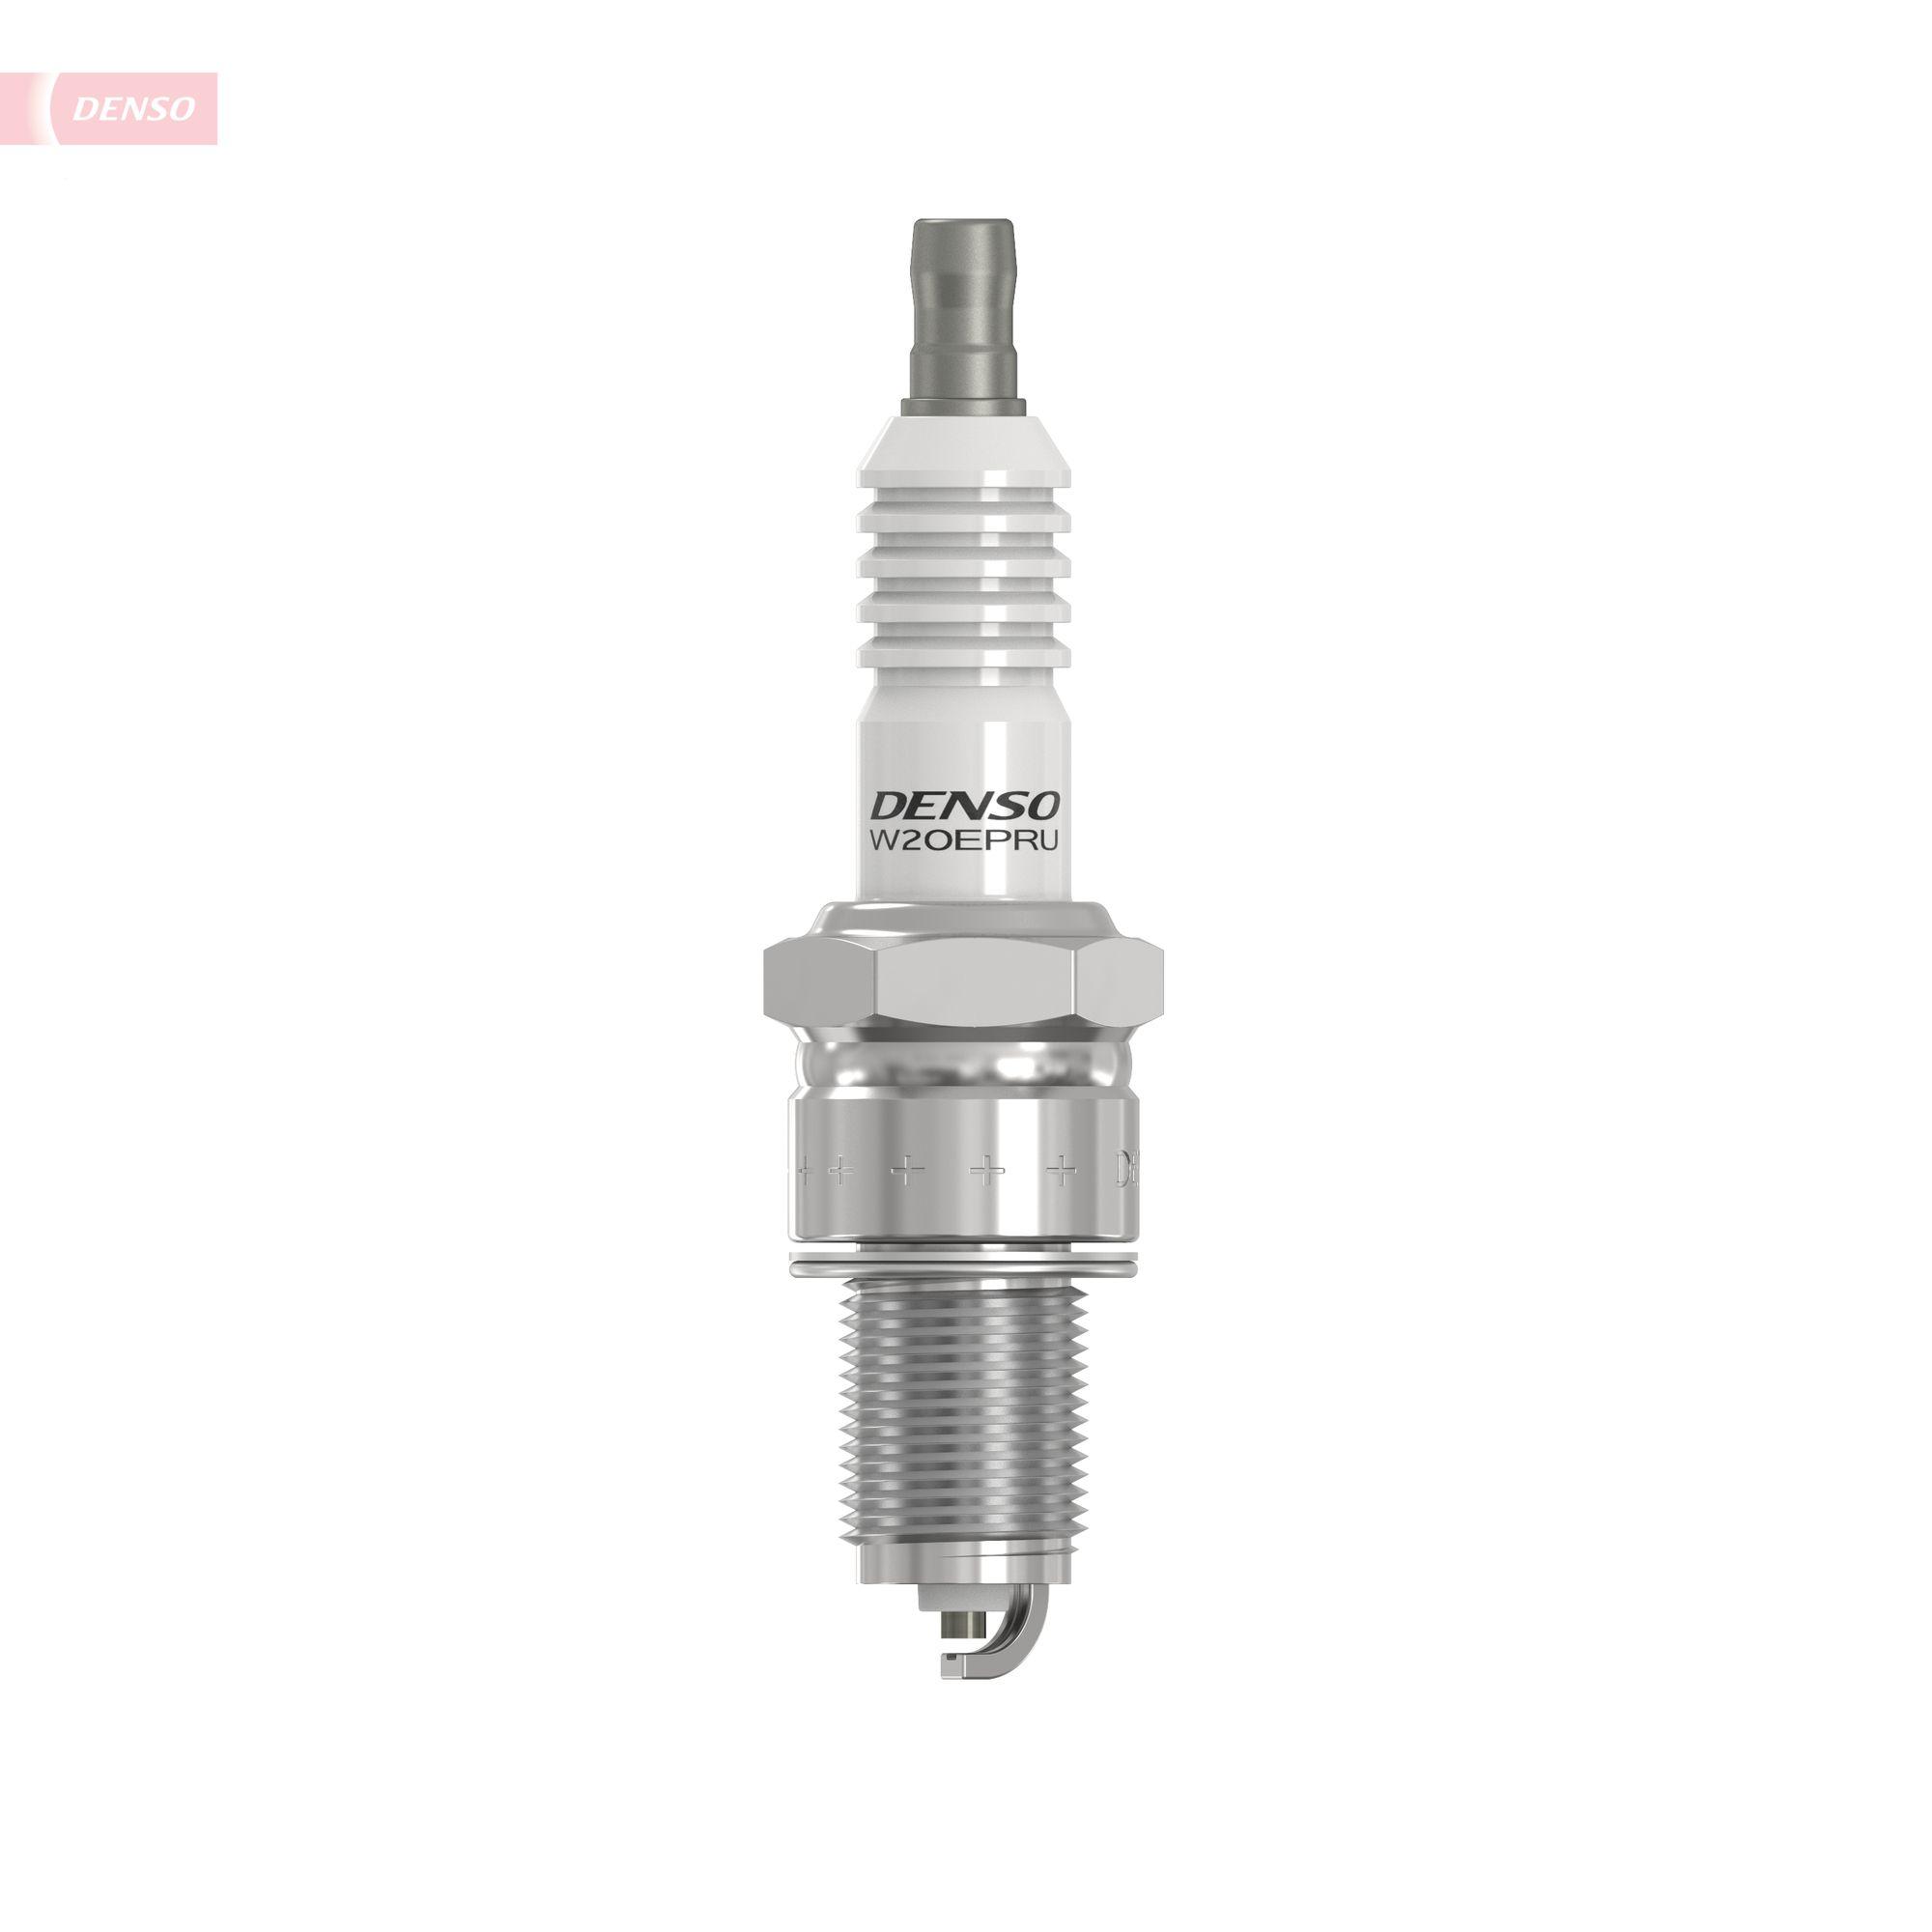 Kjøp 3047 DENSO Nickel Nøkkelvidde: 20.6 Tennplugg W20EPR-U Ikke kostbar